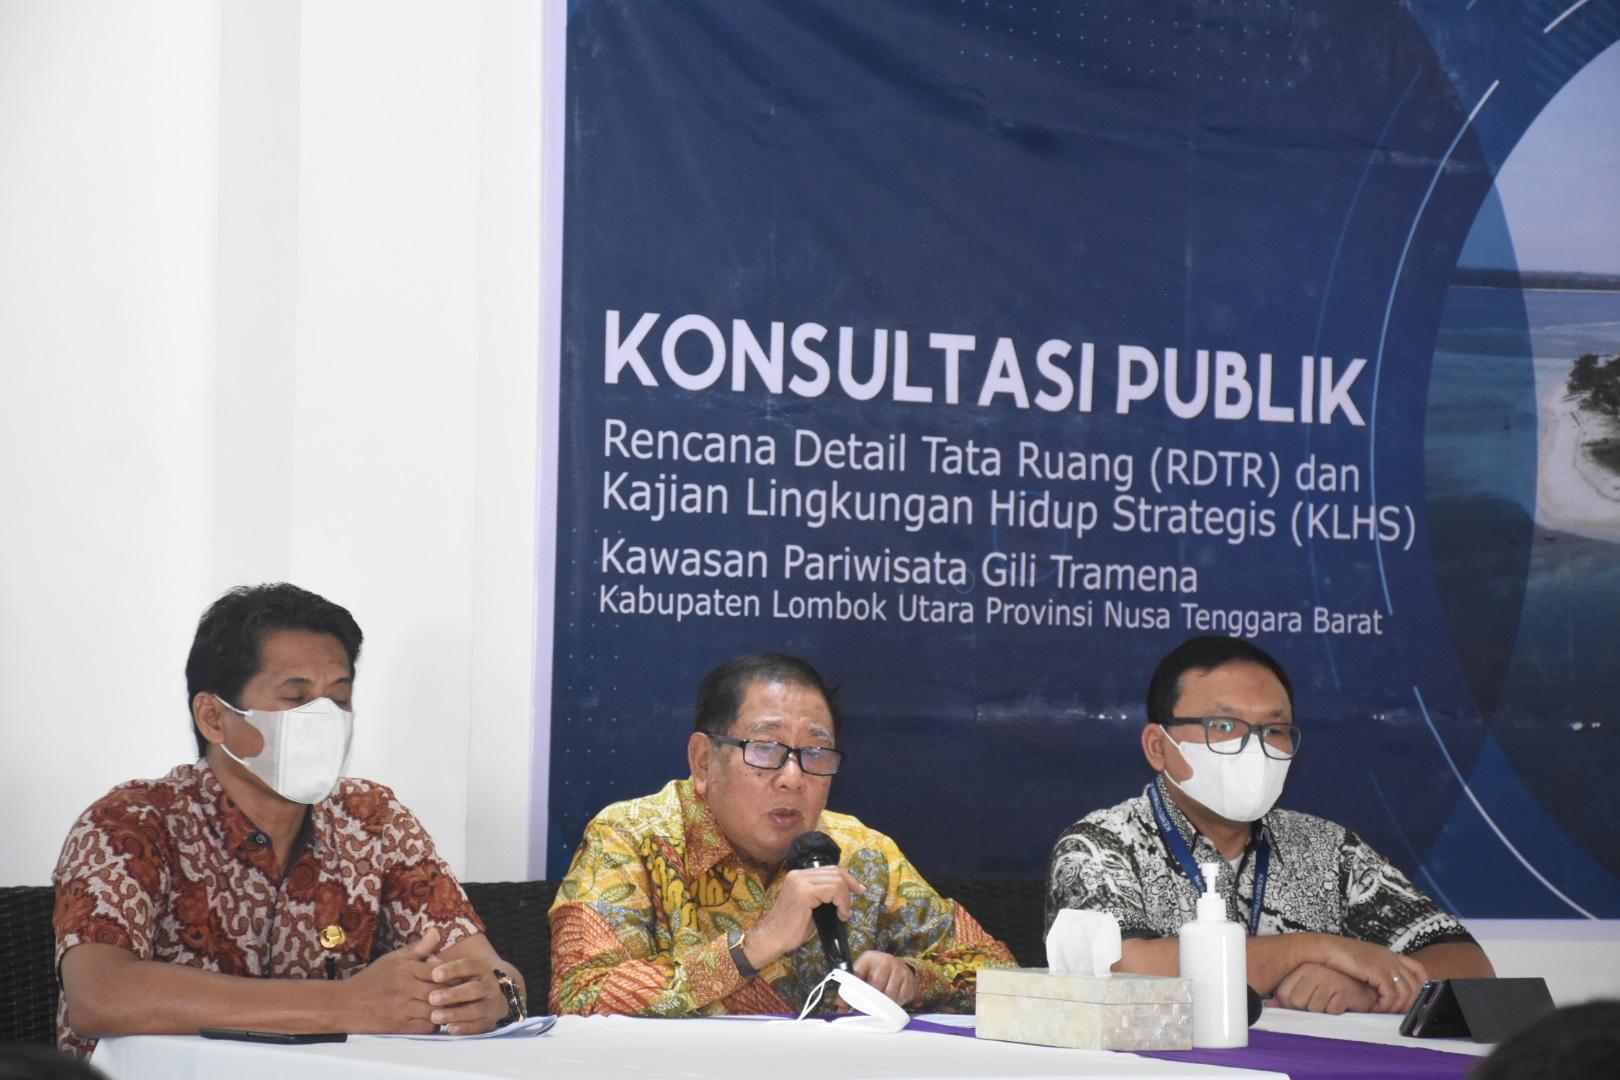 *Bupati Lombok Utara Buka Konsultasi Publik RDTR dan KLHS Kawasan Gili Tramena*